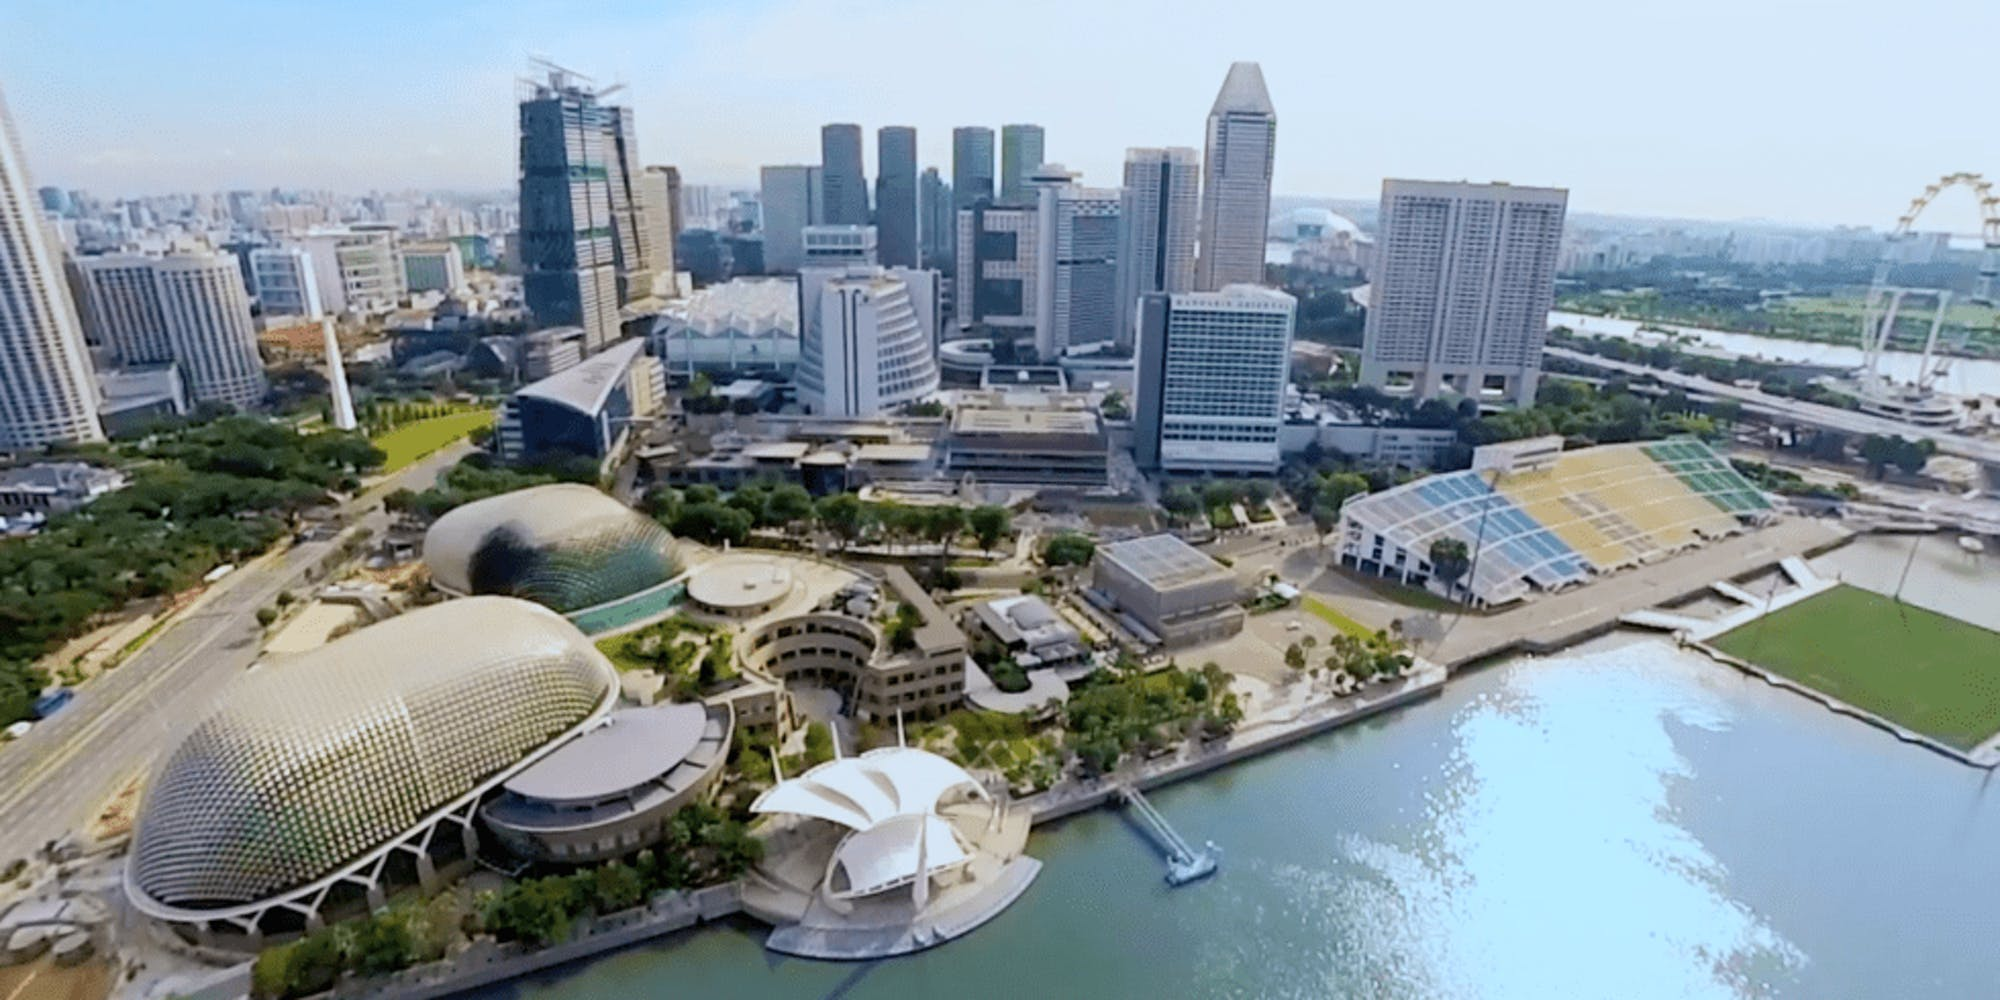 Aerial shot of Singapore's Esplanade and the floating platform